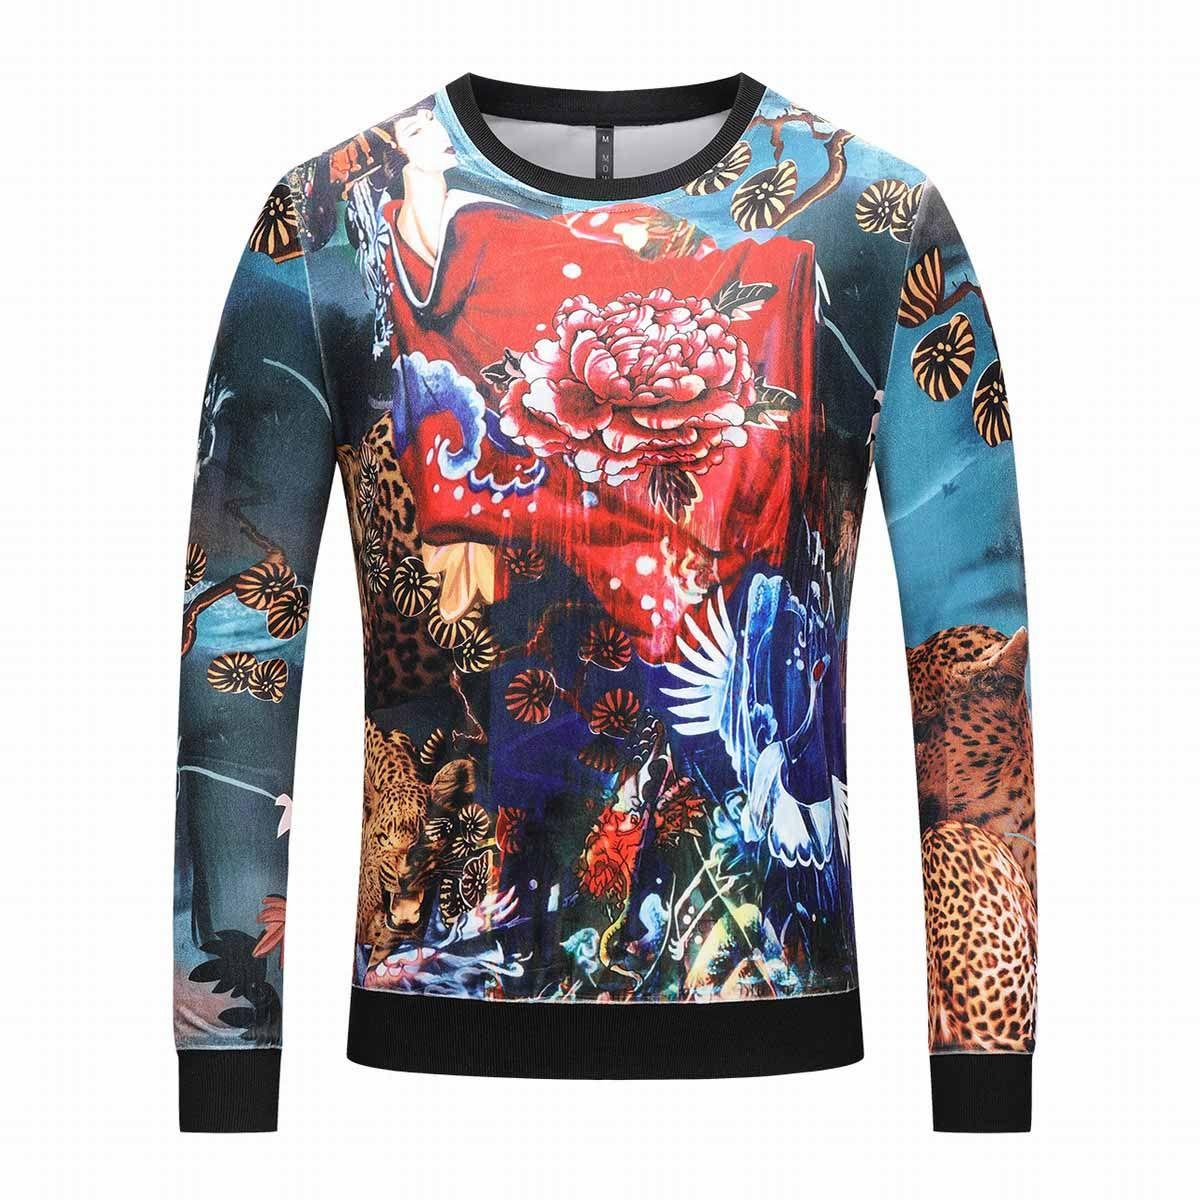 393f11f0c27 Men s Brand Hoodie Light Wool Sweatshirt Fashion Print Hooded ...